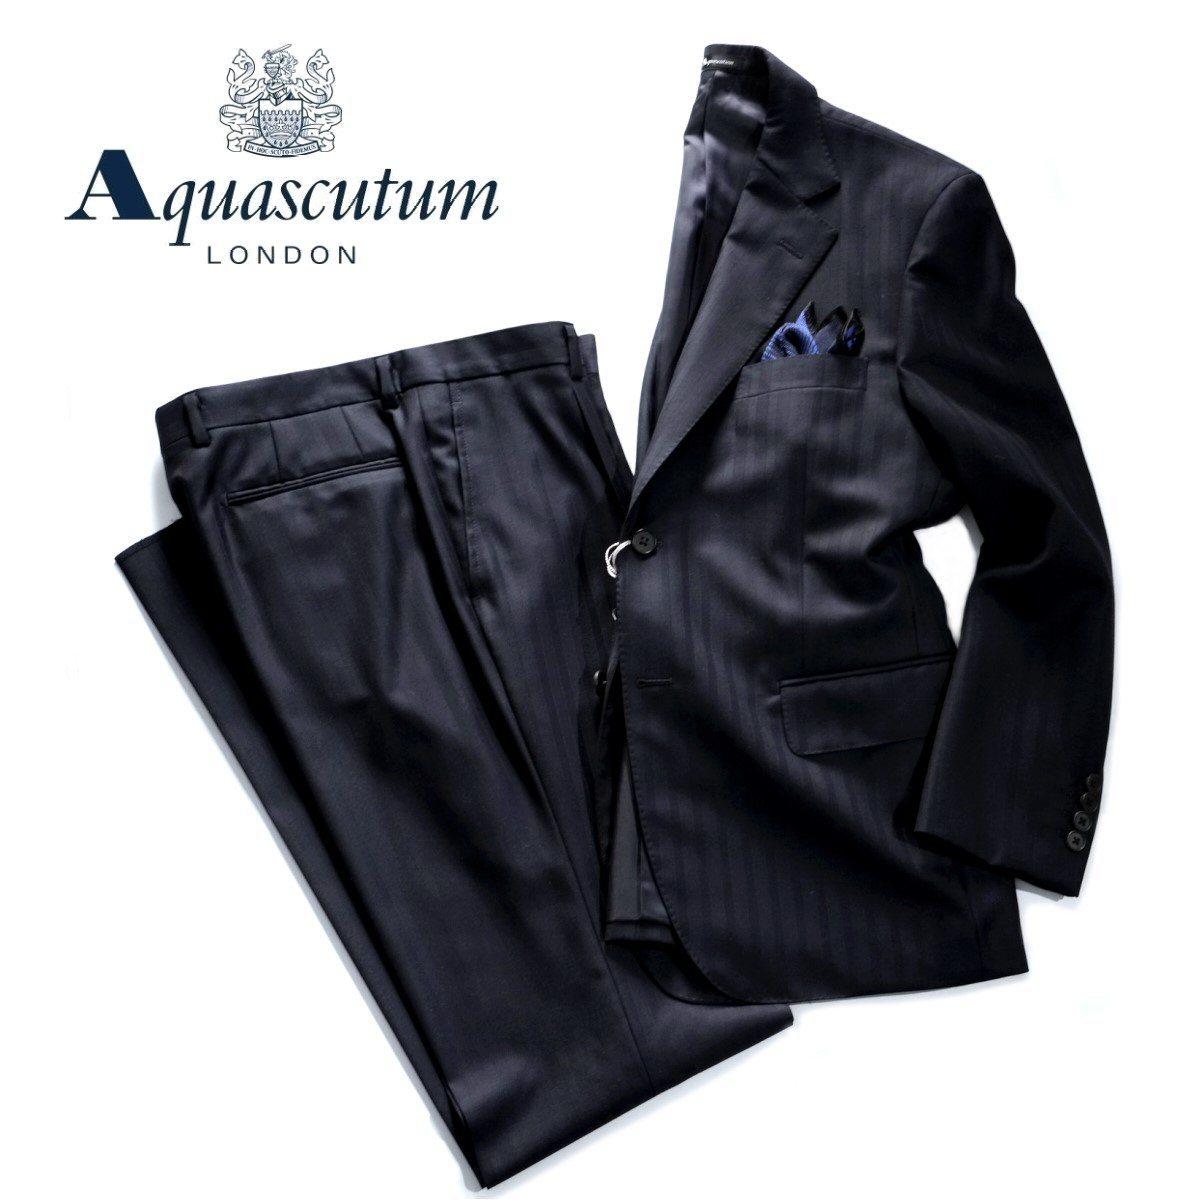 Aquascutum【アクアスキュータム】定価176,000円(税込)◆60%OFF◆日本製シャドーストライプウールスーツ濃紺 ネイビー総裏仕立て